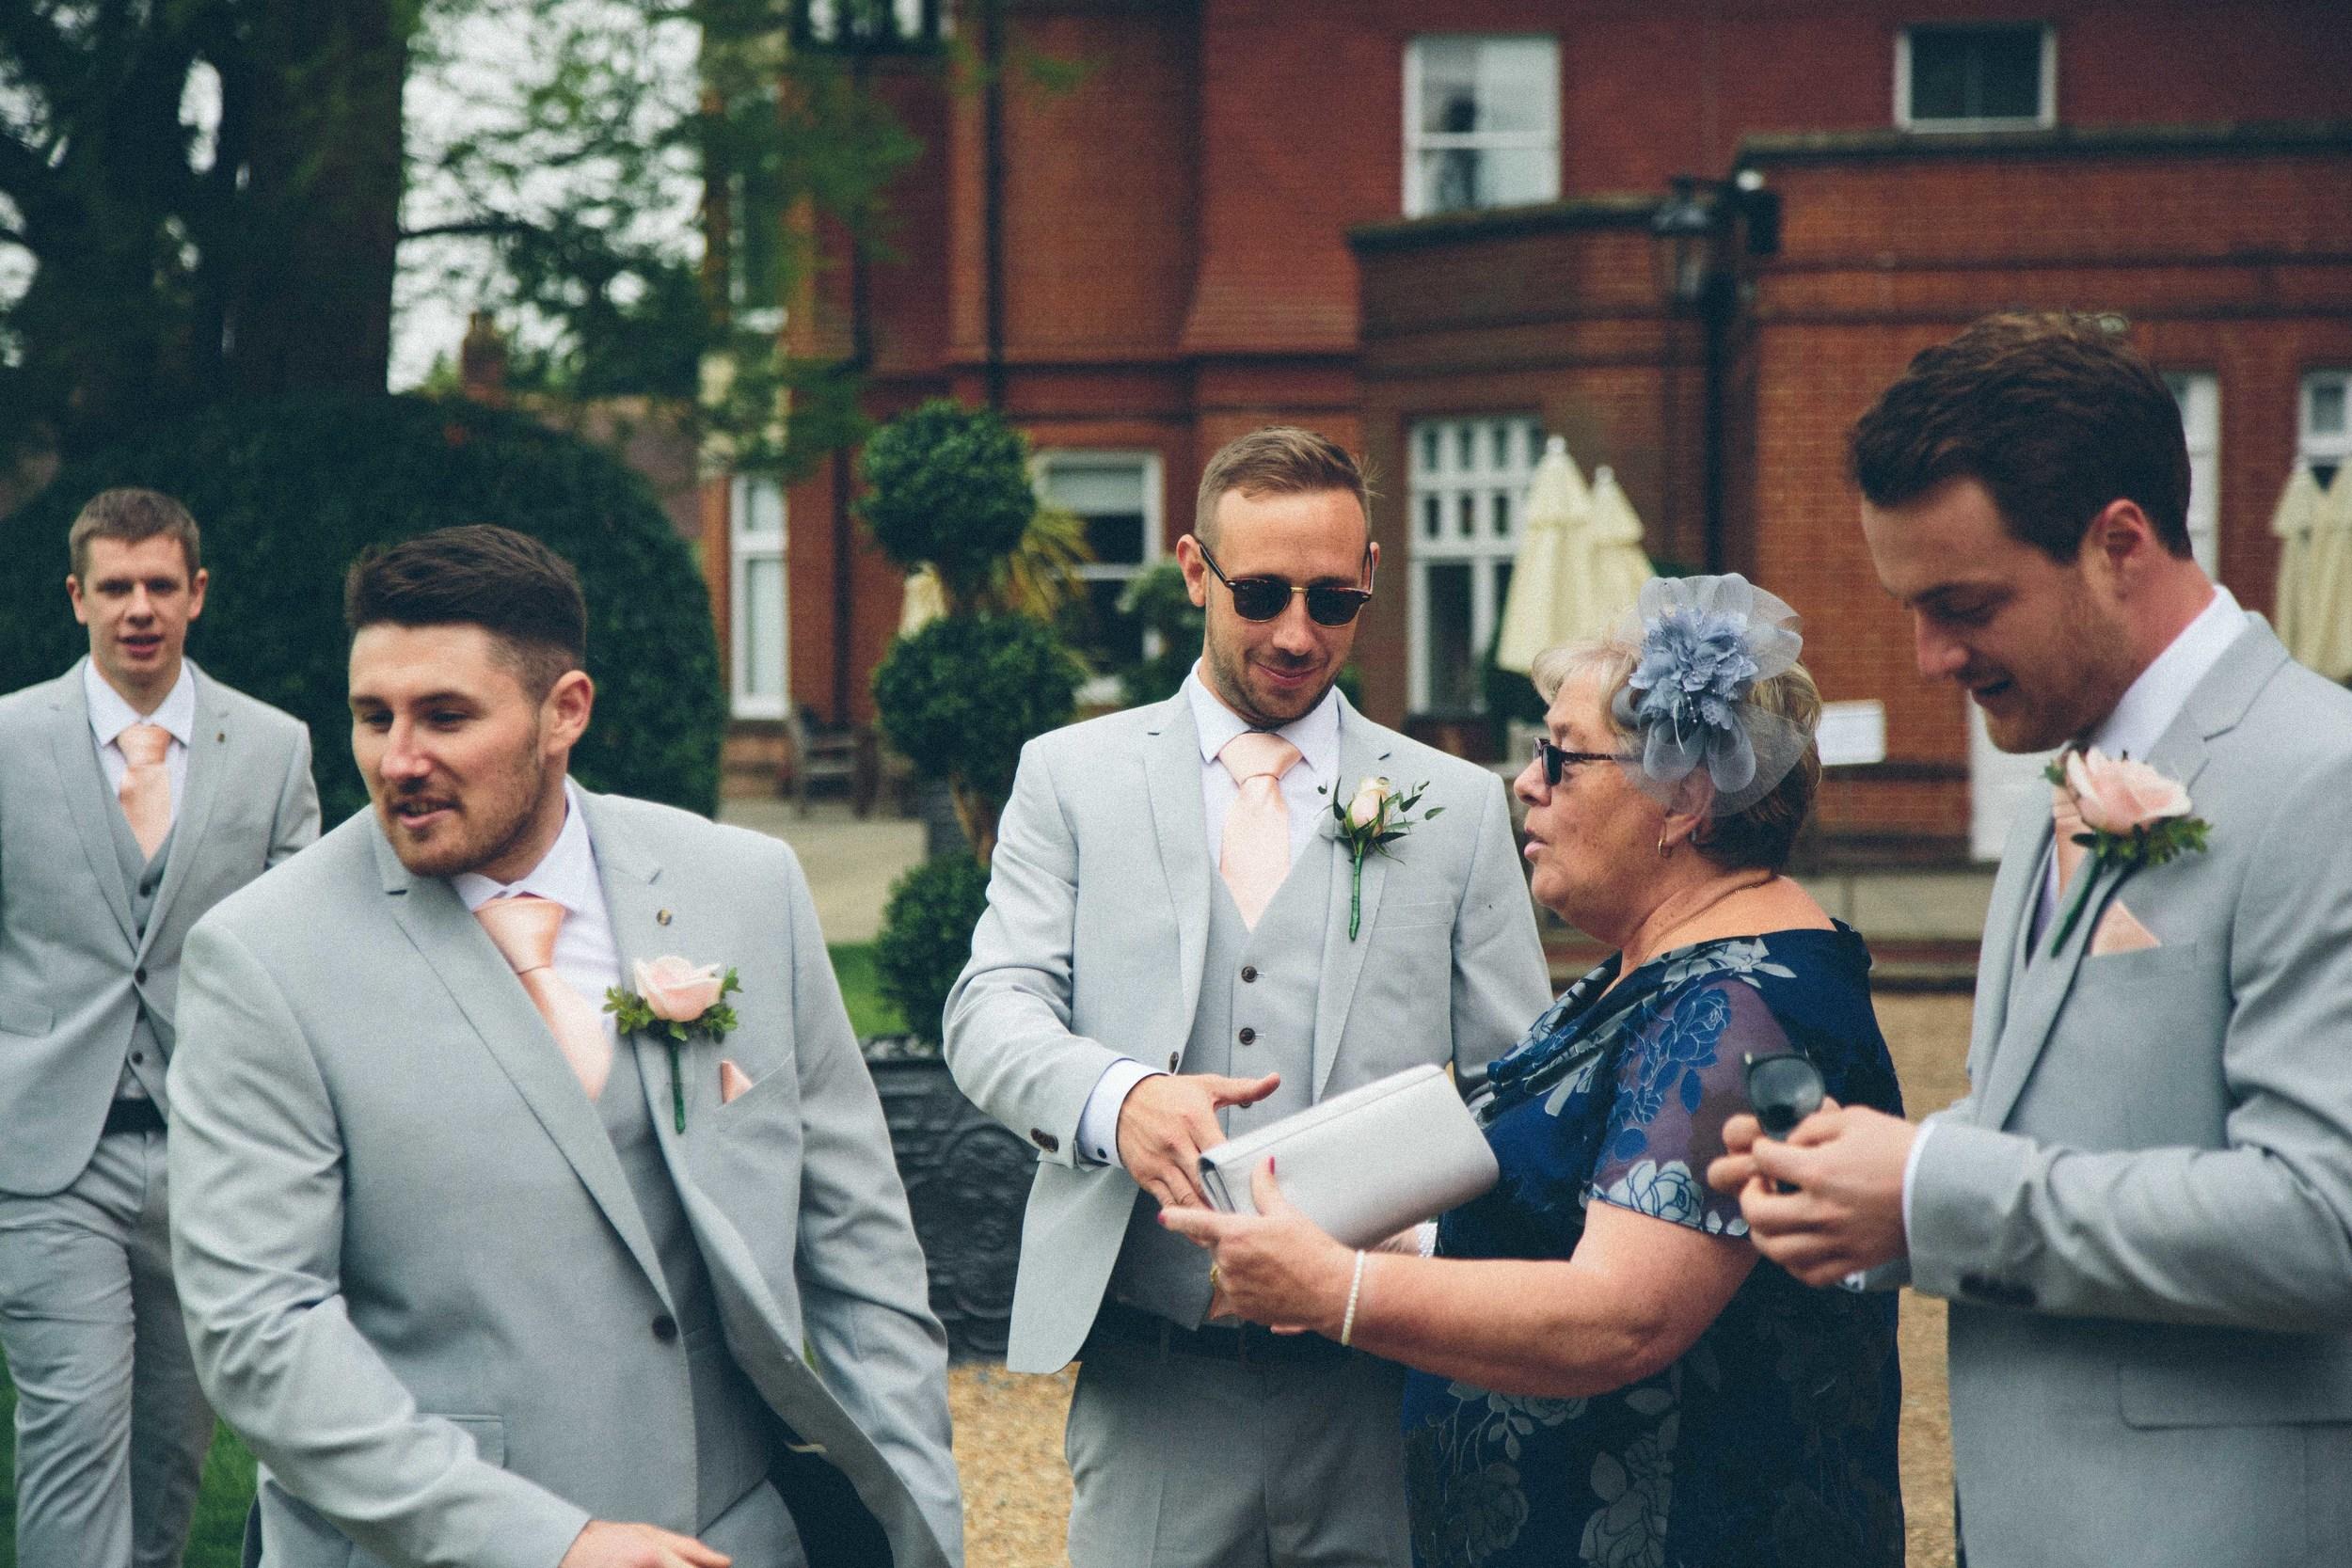 Woodlands-Park-Hotel-Cobham-Surrey-wedding-9